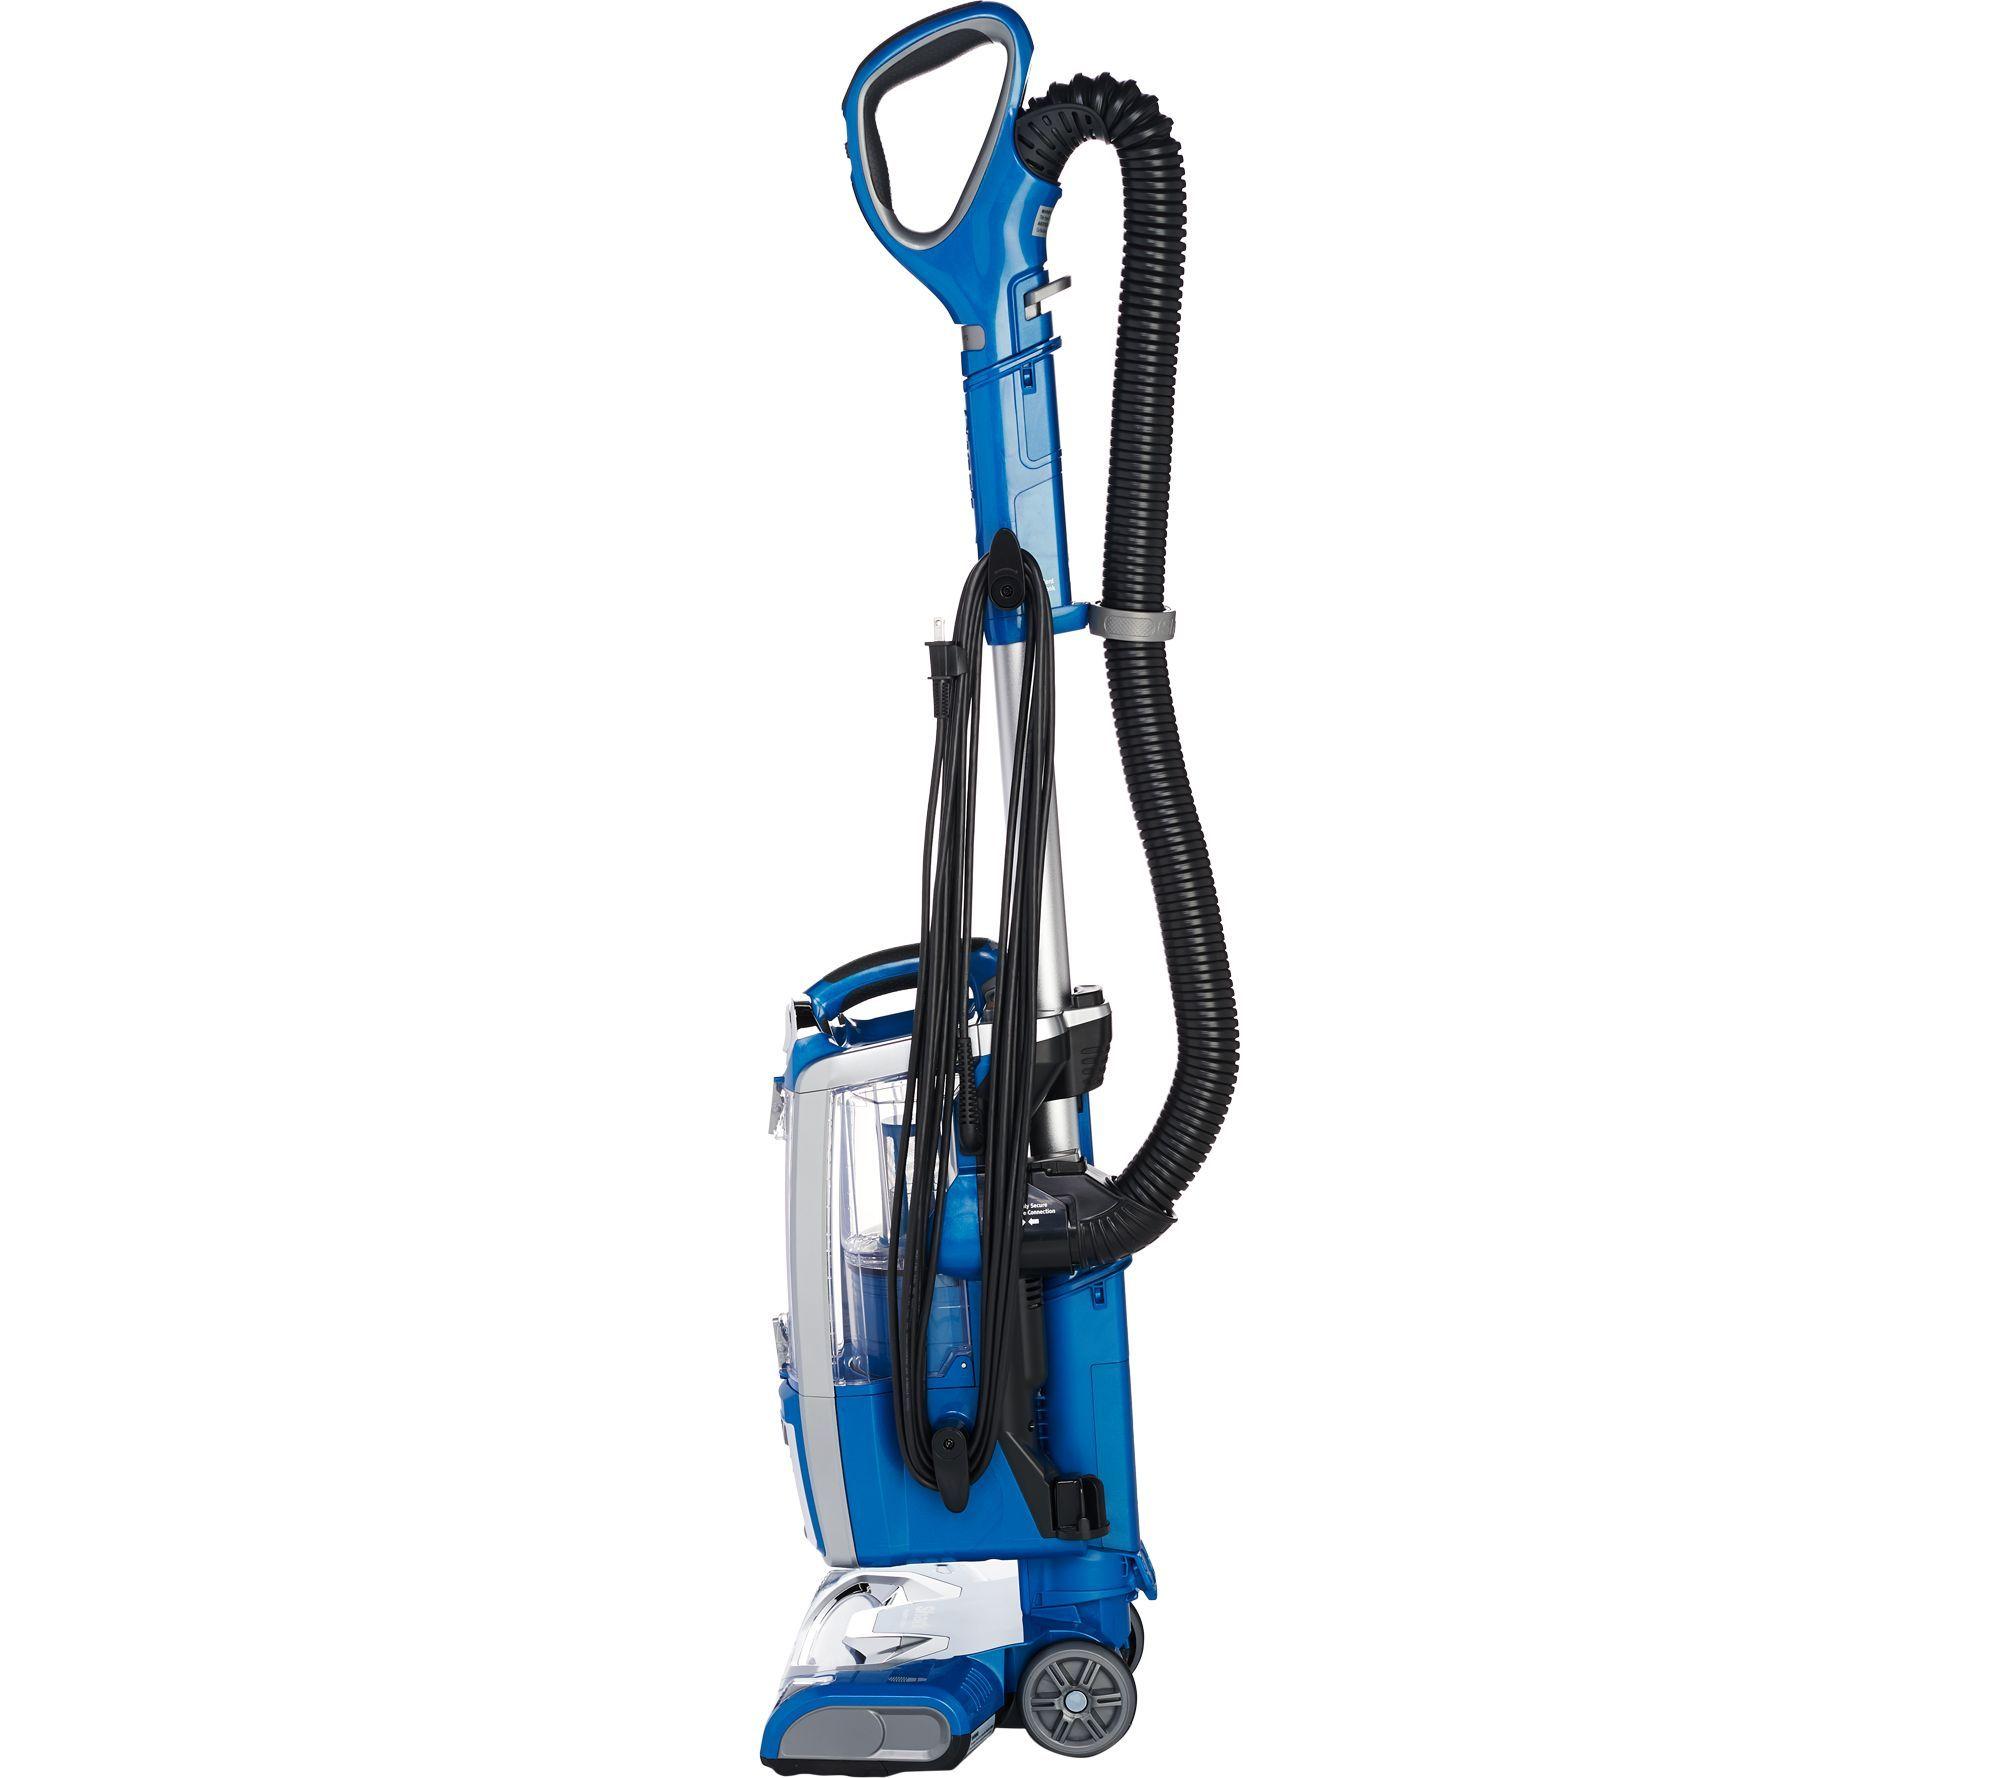 Shark Rotator Speed Powered LiftAway 3in1 Vacuum